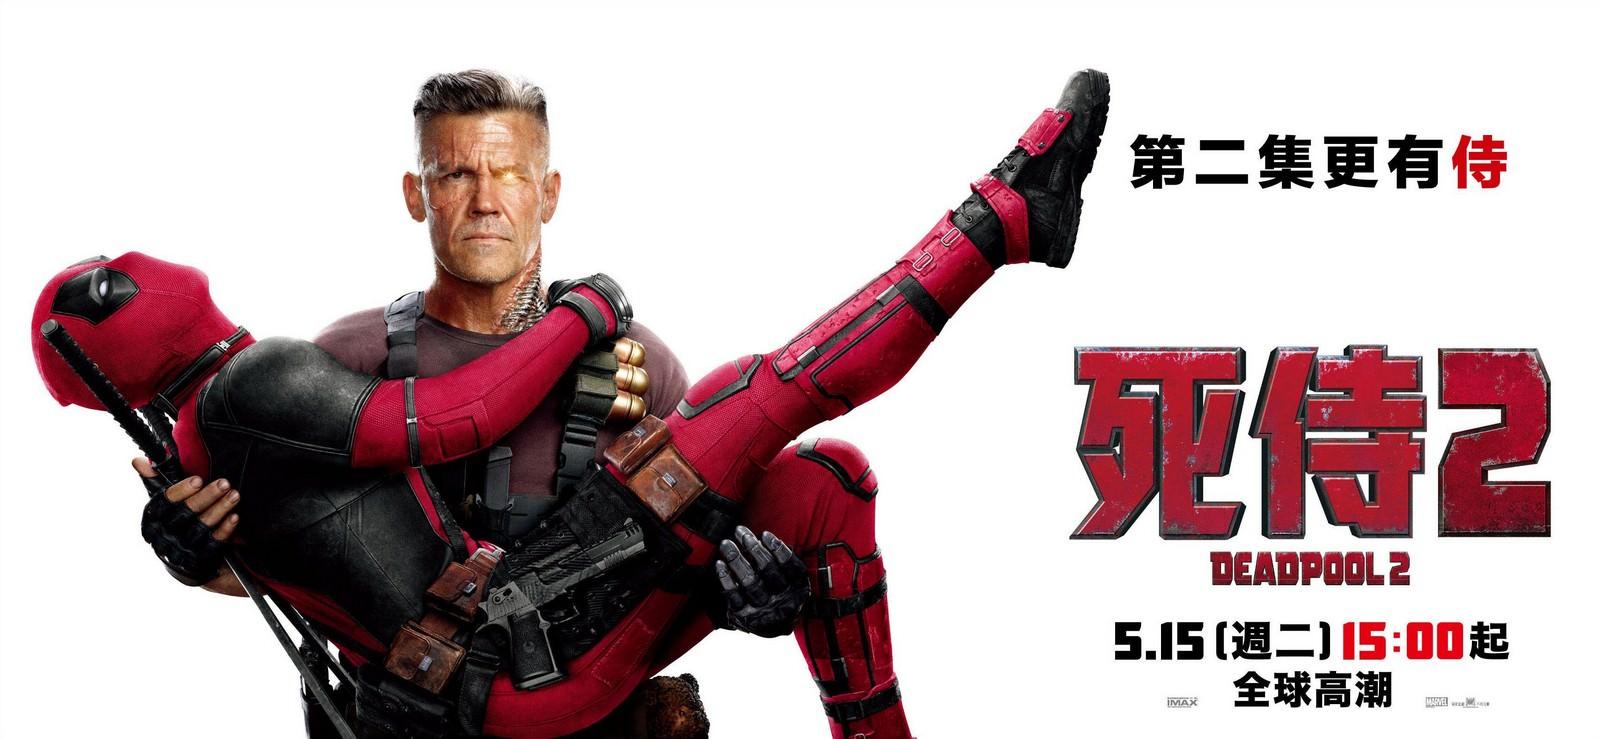 Movie, Deadpool 2(美國) / 死侍2(台.中.港), 電影海報, 台灣, 橫版